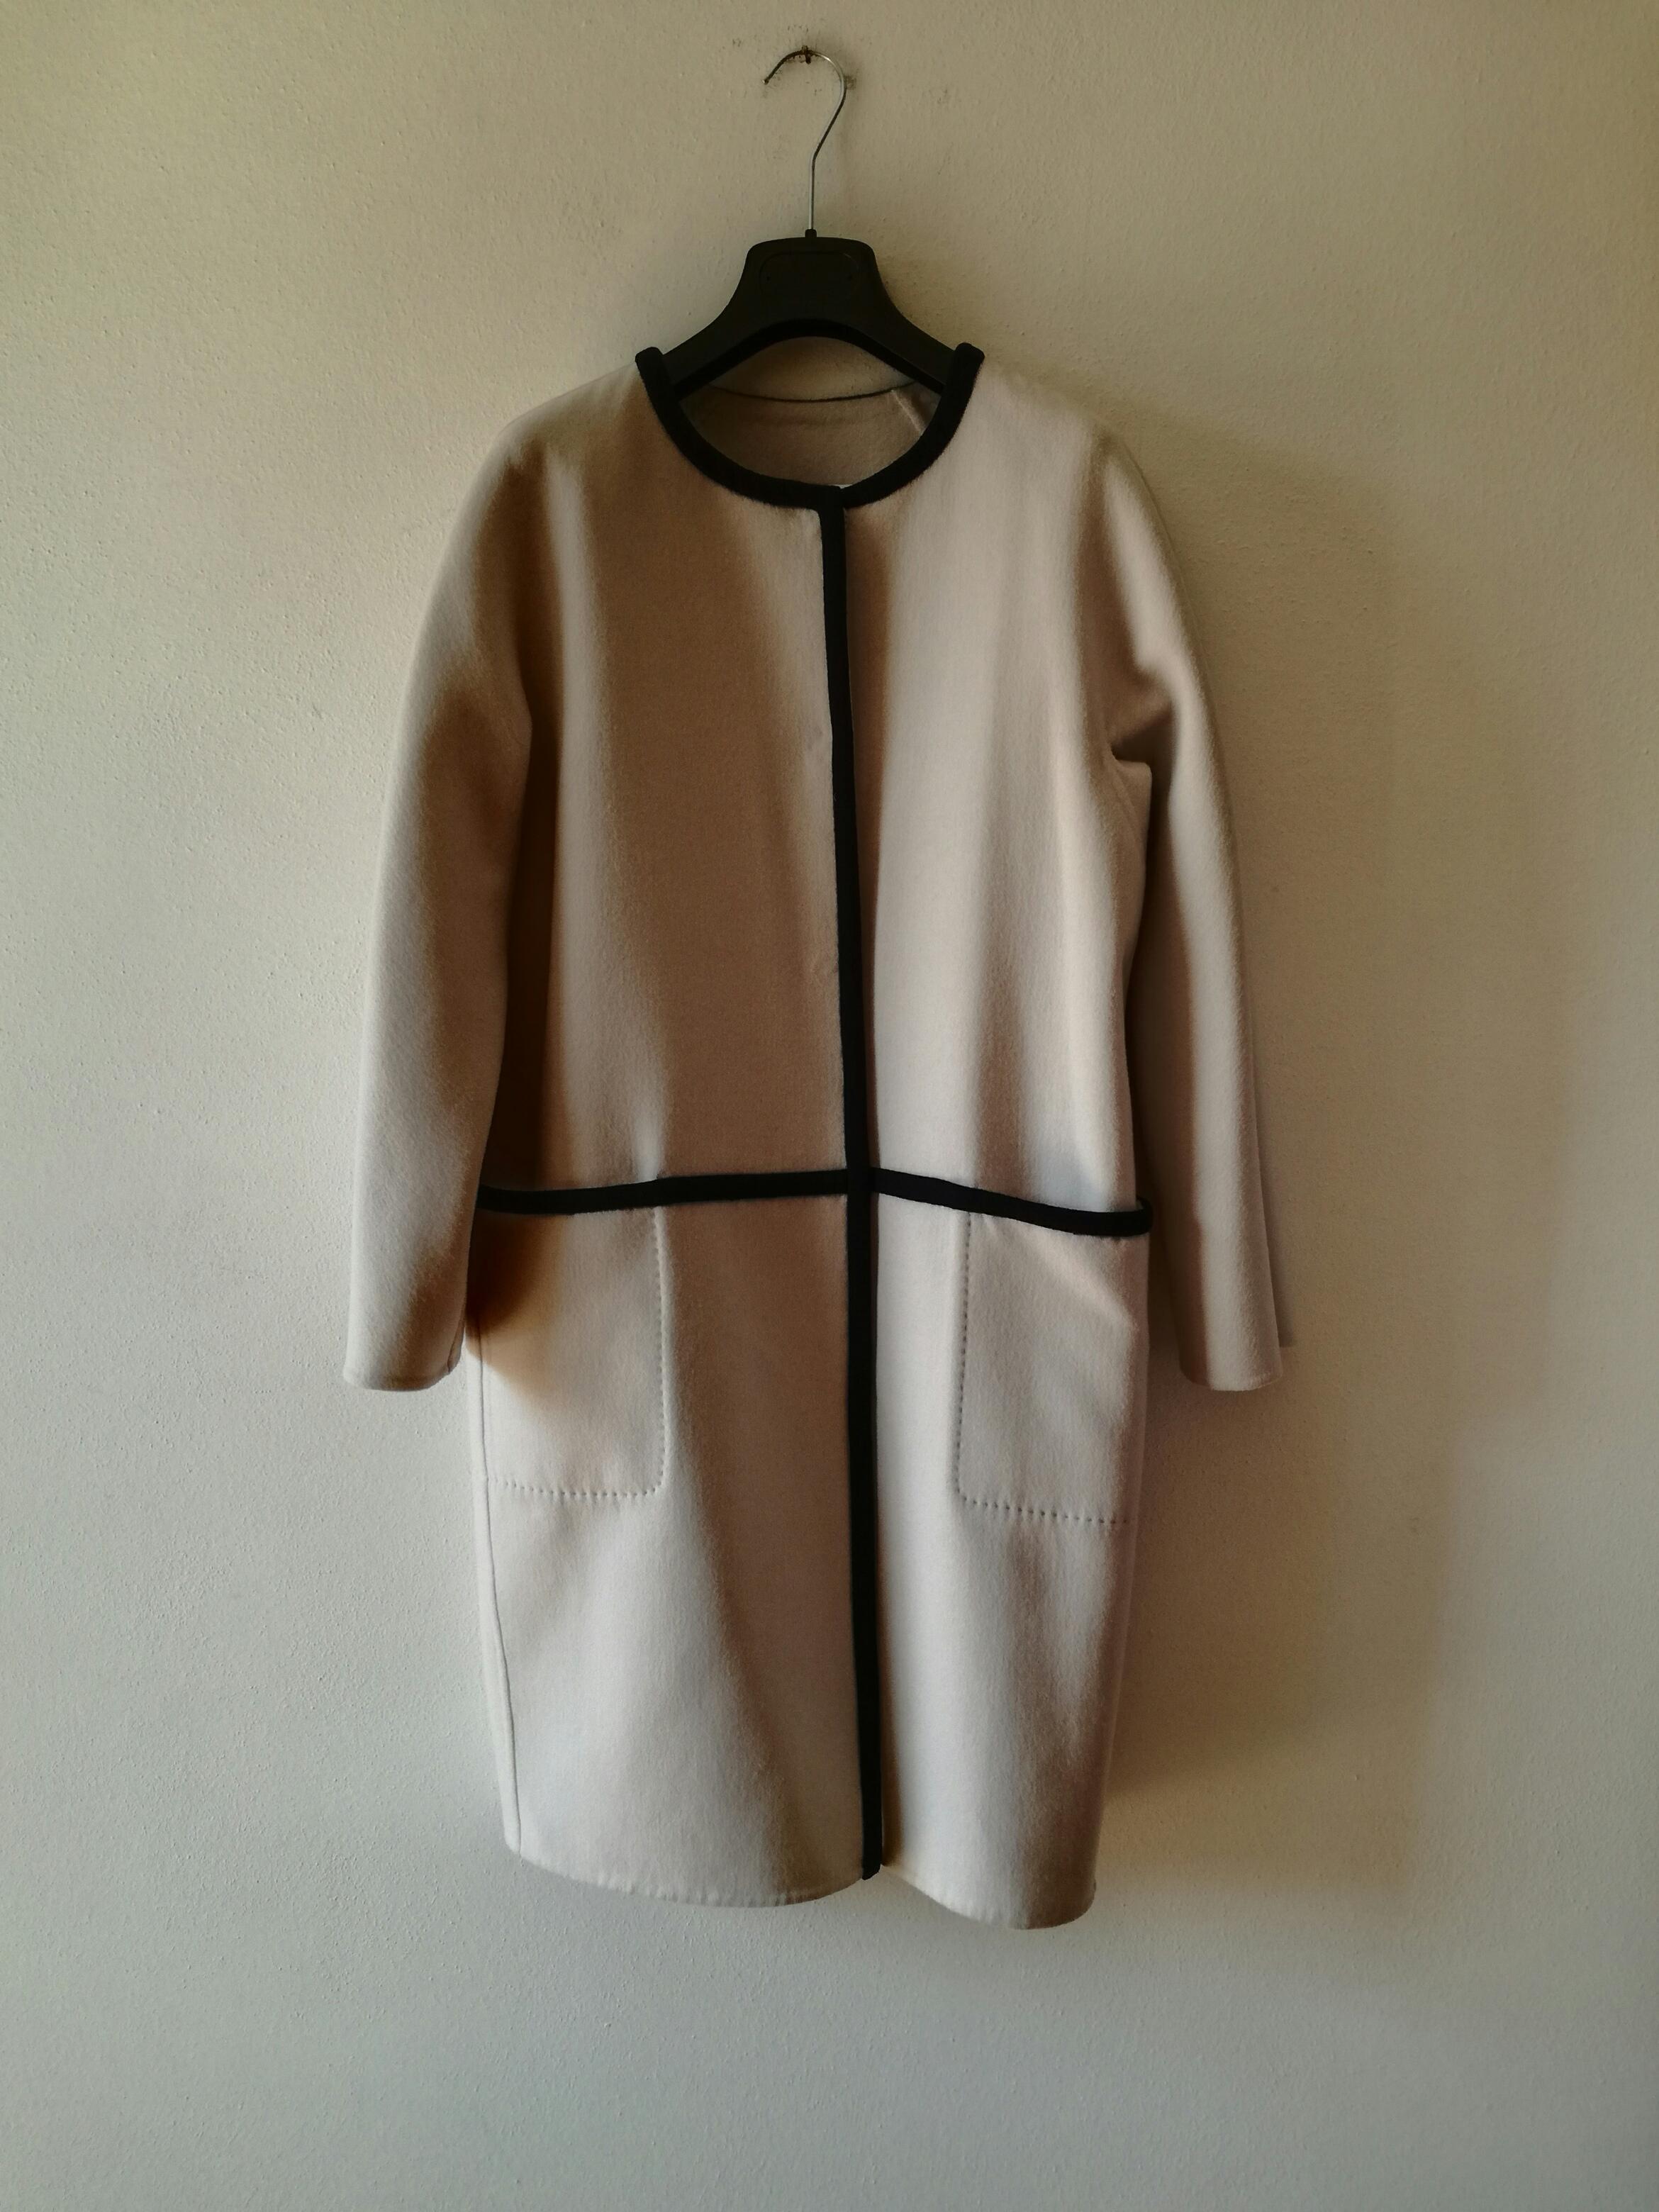 Max Mara Natural Savona Wool And Angora-blend Coat. 29. 123456 505678b17d8